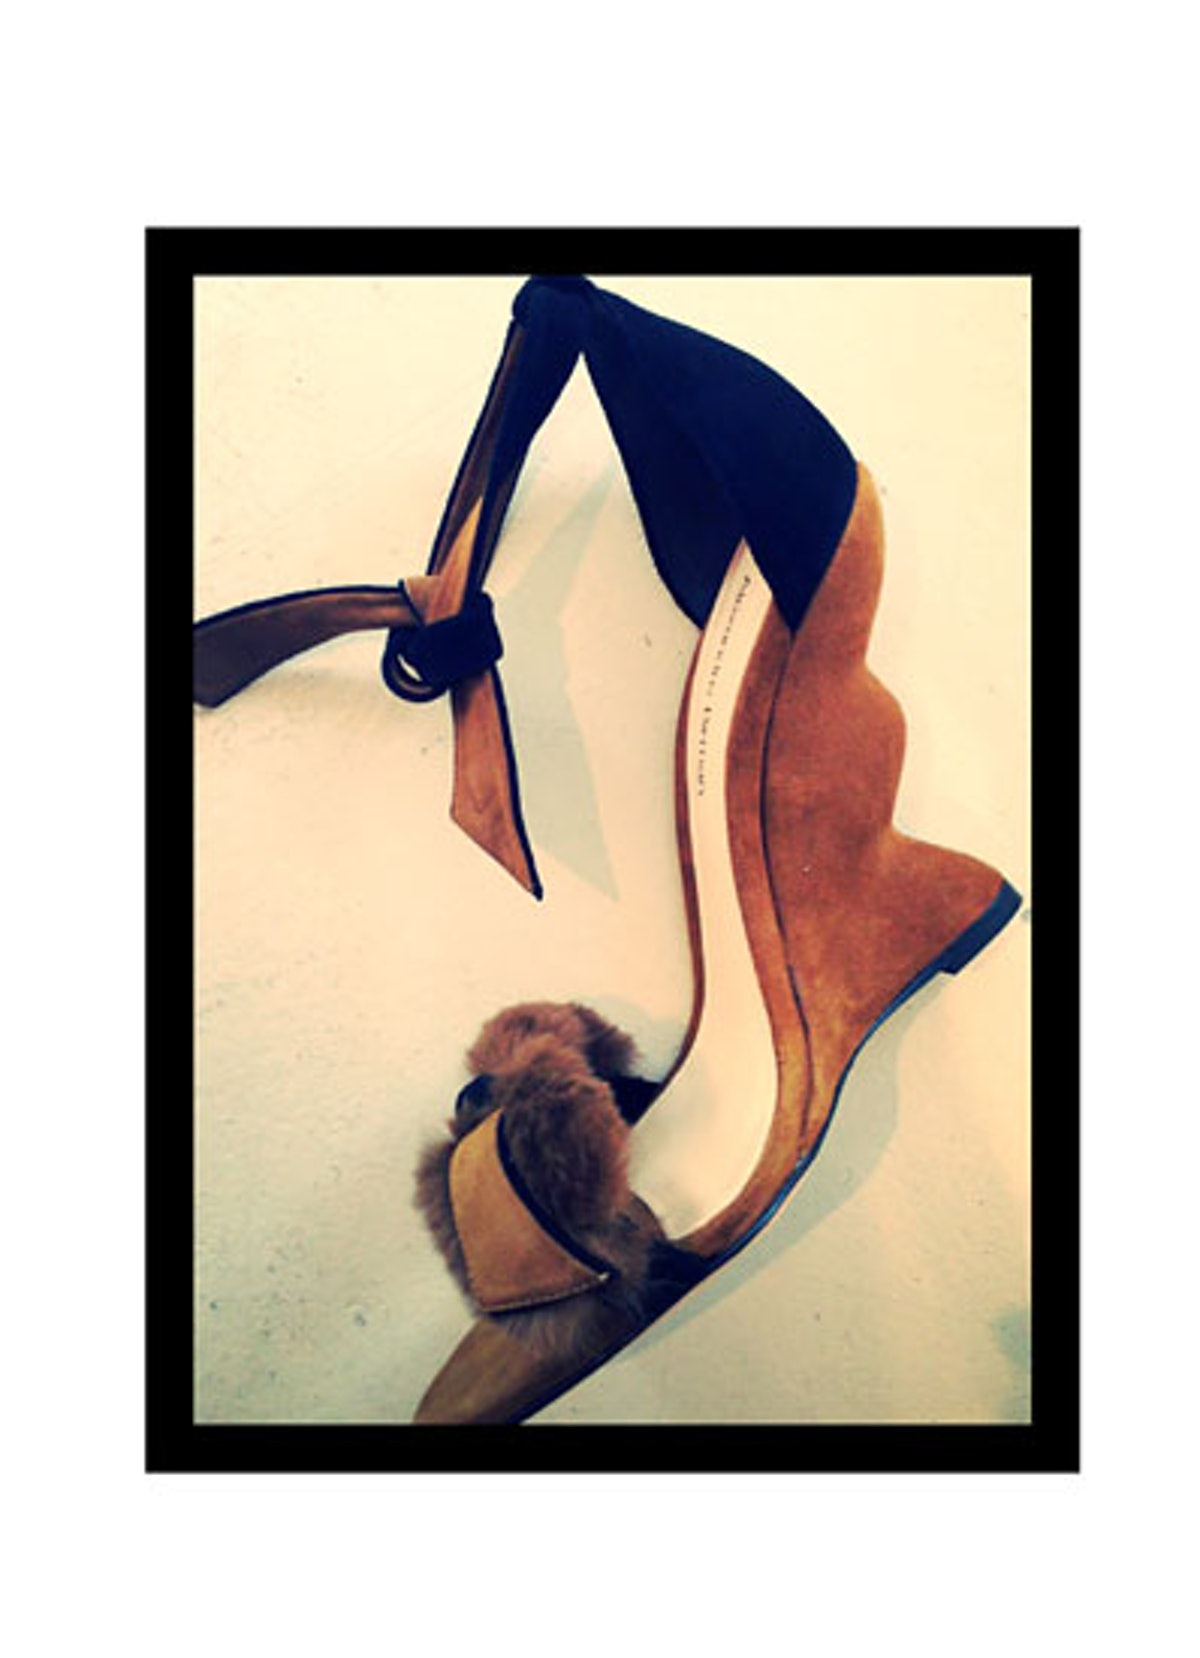 acss-best-shoes-fall-2013-03-v.jpg